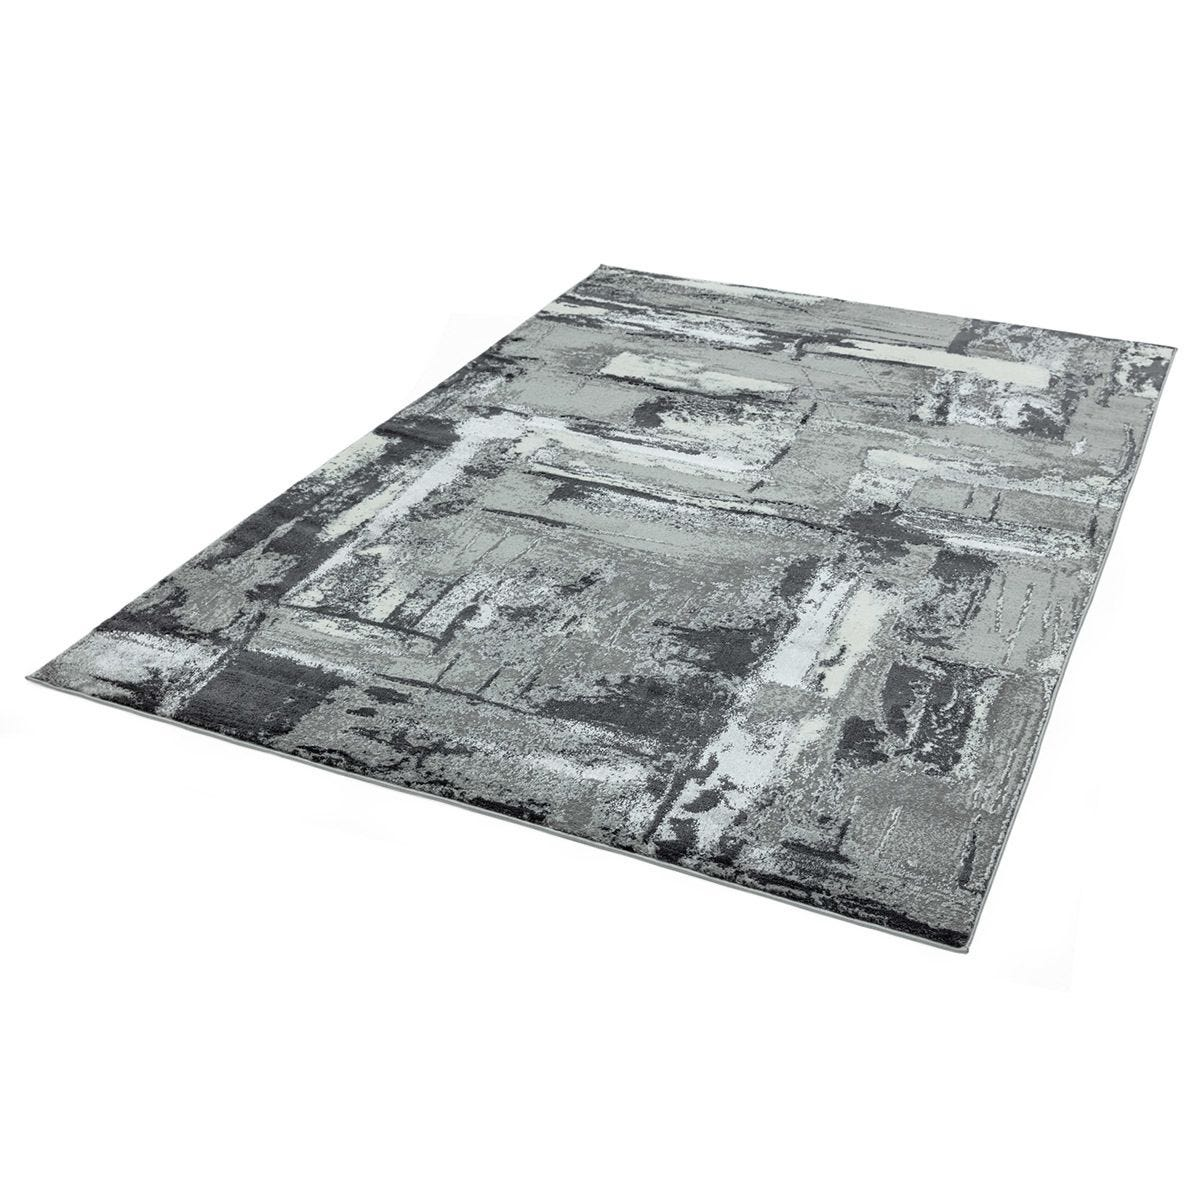 Asiatic Carpets Orion Decor Rug - Grey